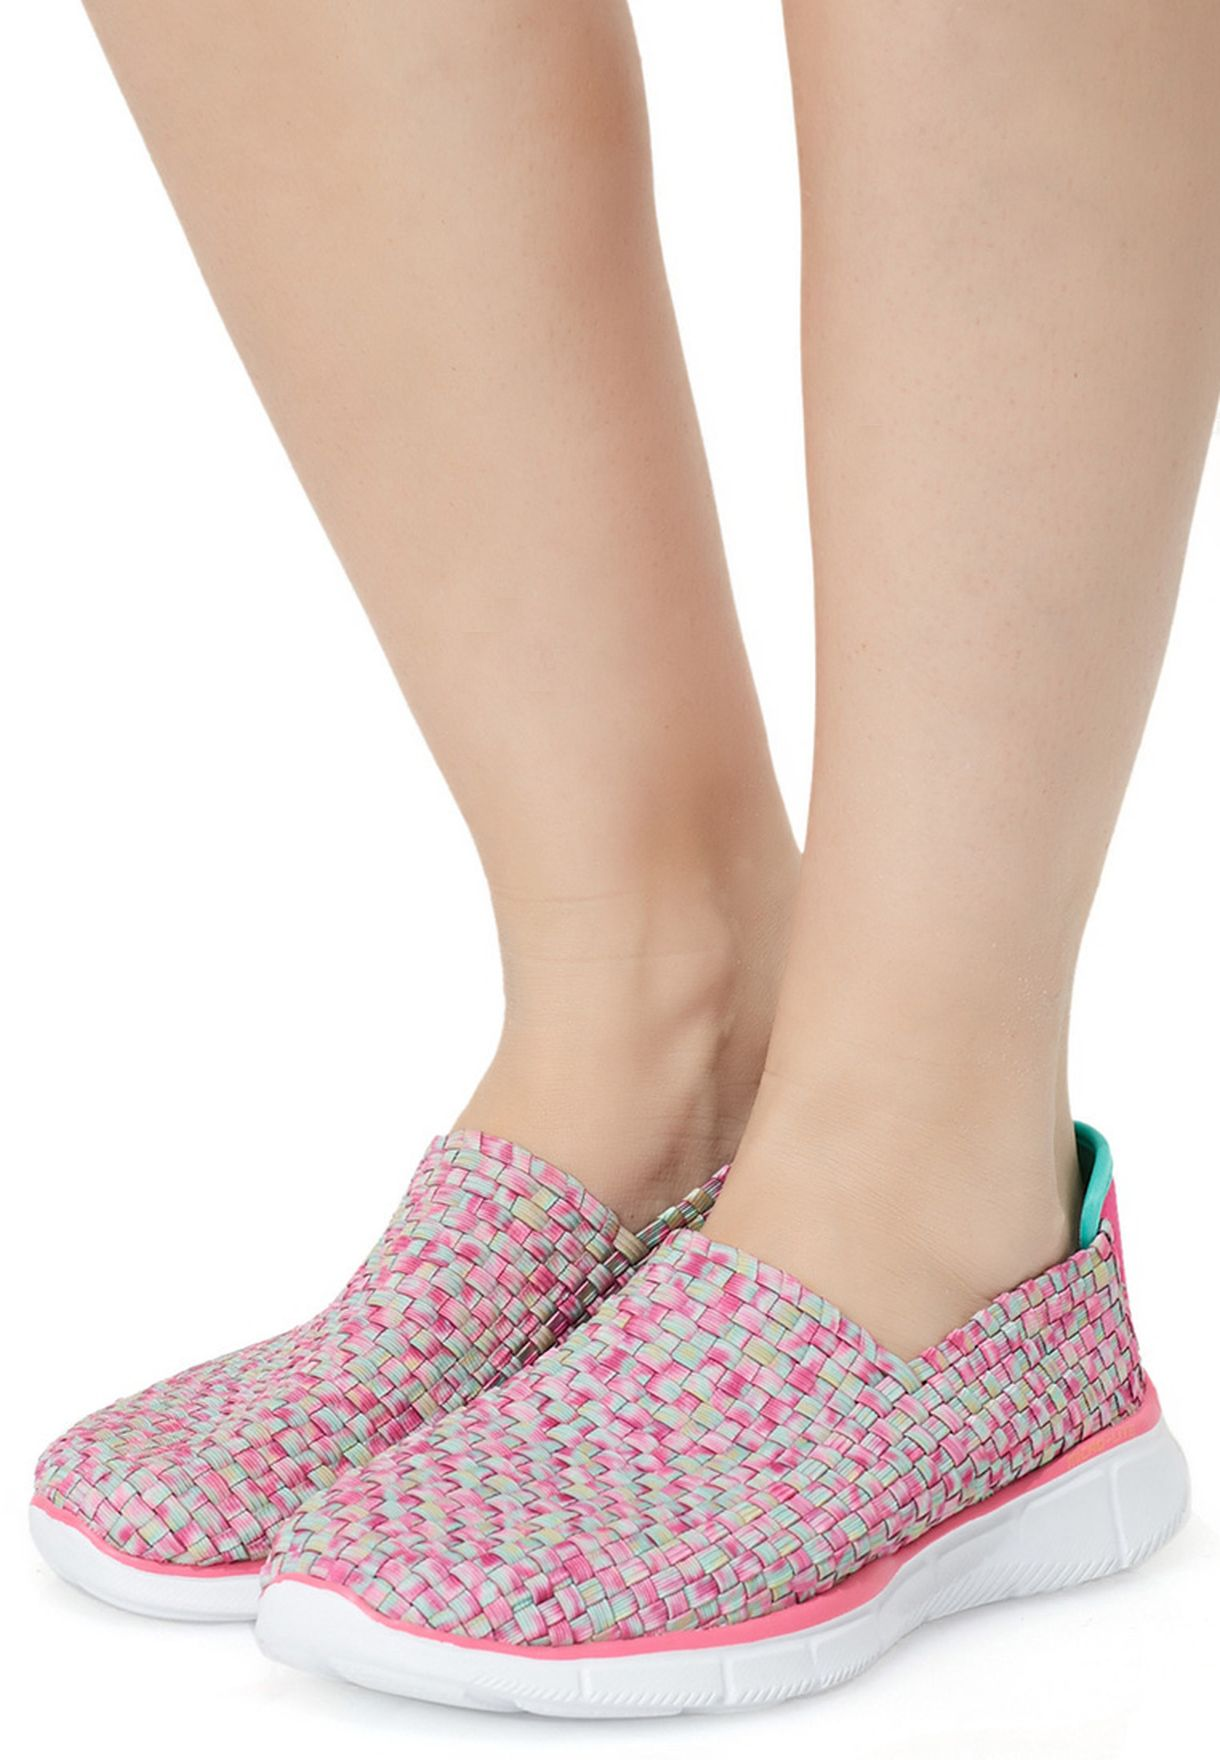 adf082cc251b Shop Skechers pink Equalizer Vivid Dream Comfort Shoes for Women ...